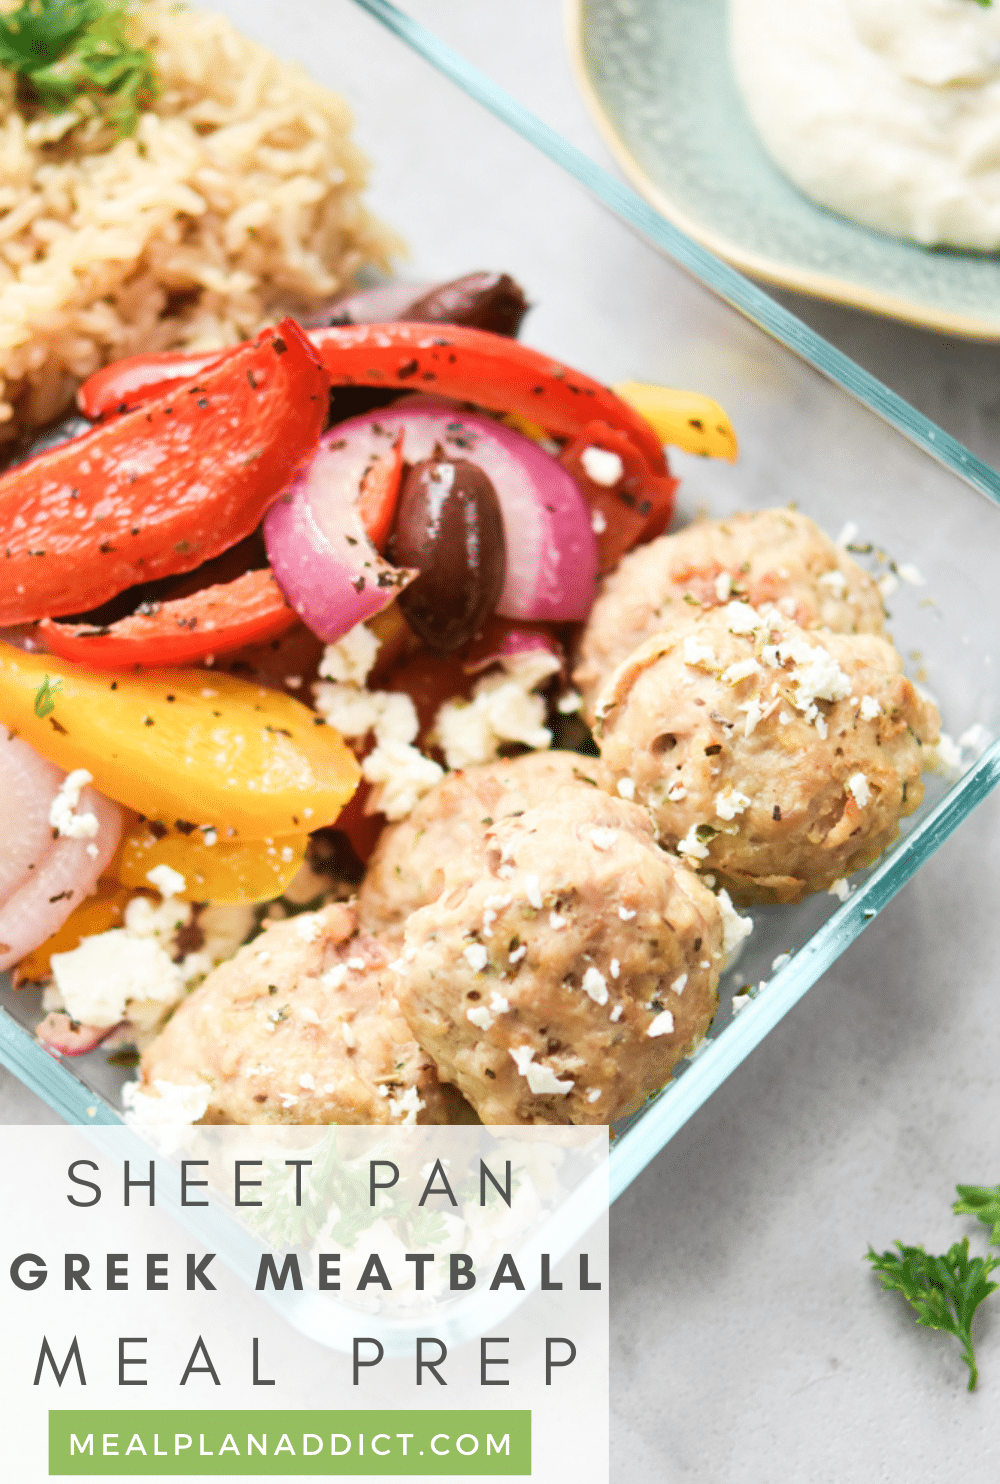 Greek meatballs pin for Pinterest